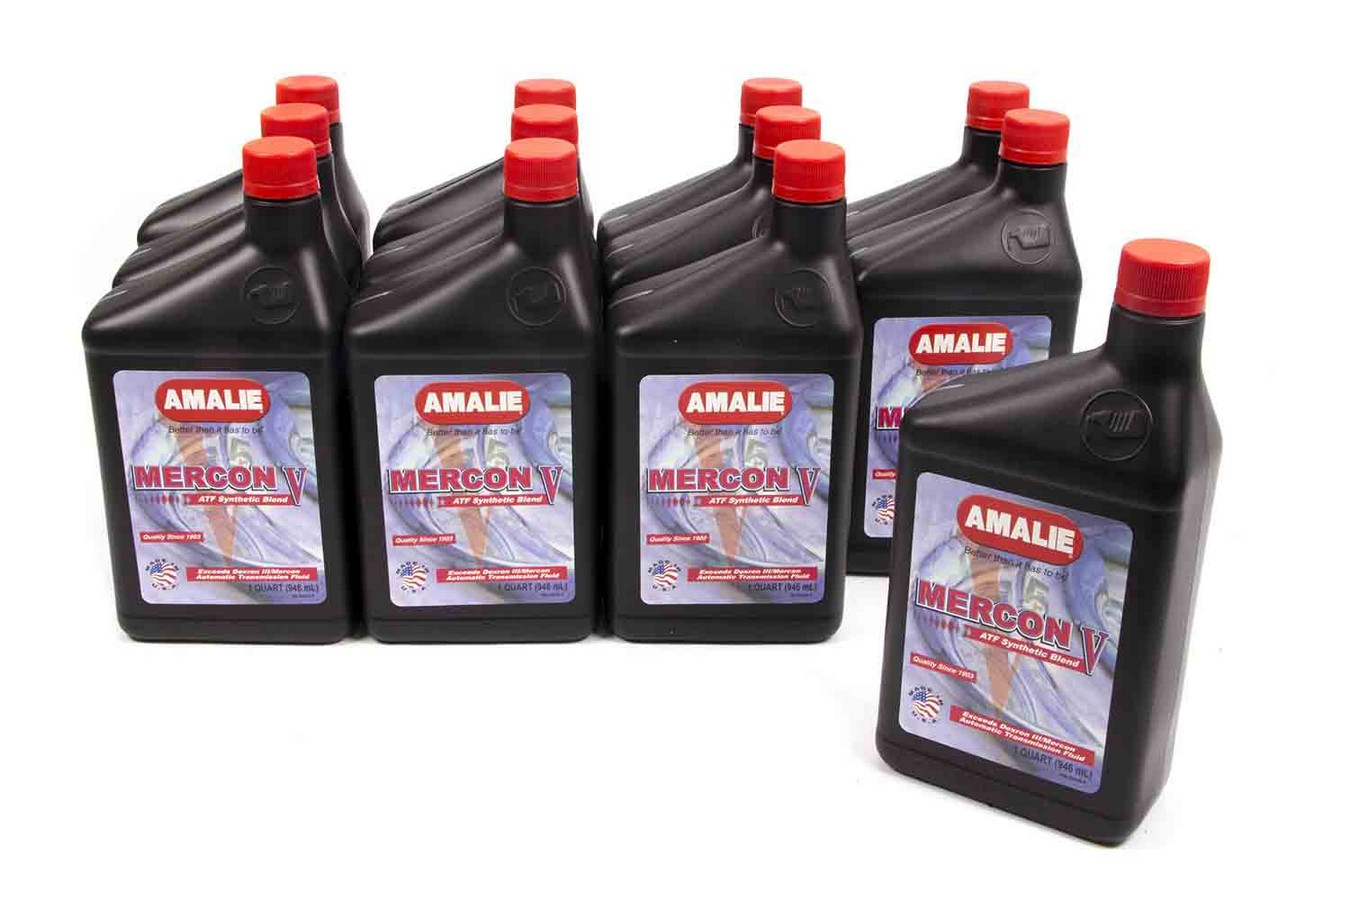 Amalie Mercon V ATF Transmission Fluid 1 qt Case of 12 P N 160-62856-56 by Amalie